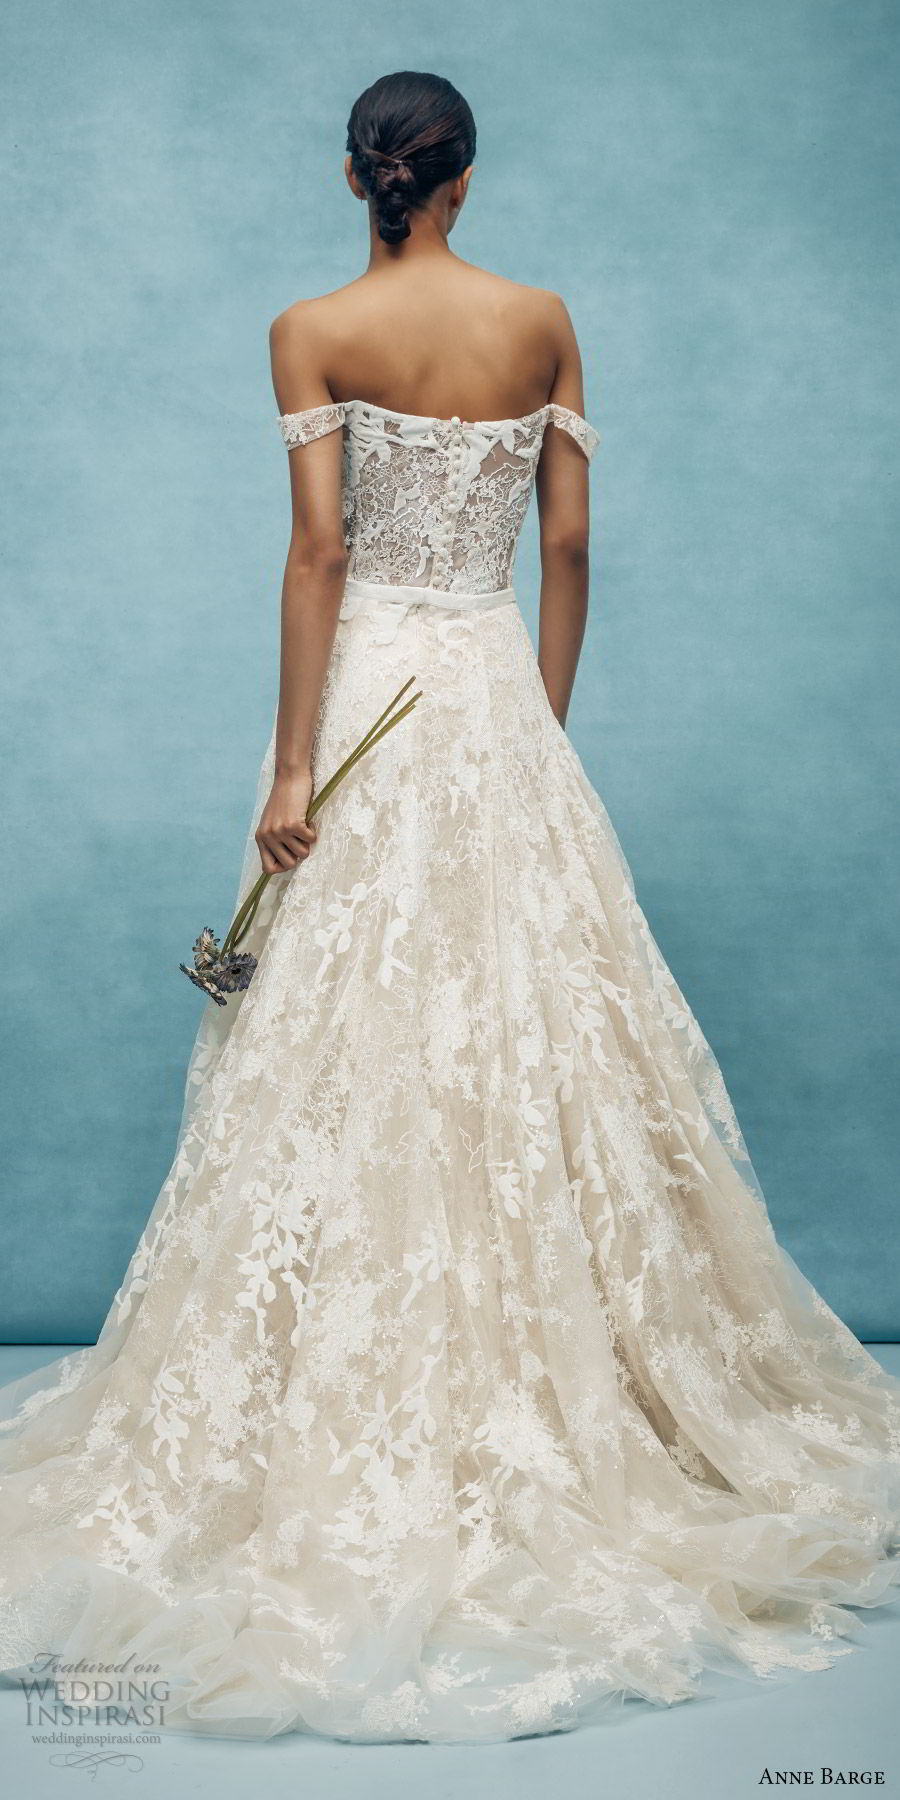 Anne Barge Spring 2020 Wedding Dresses Wedding Inspirasi